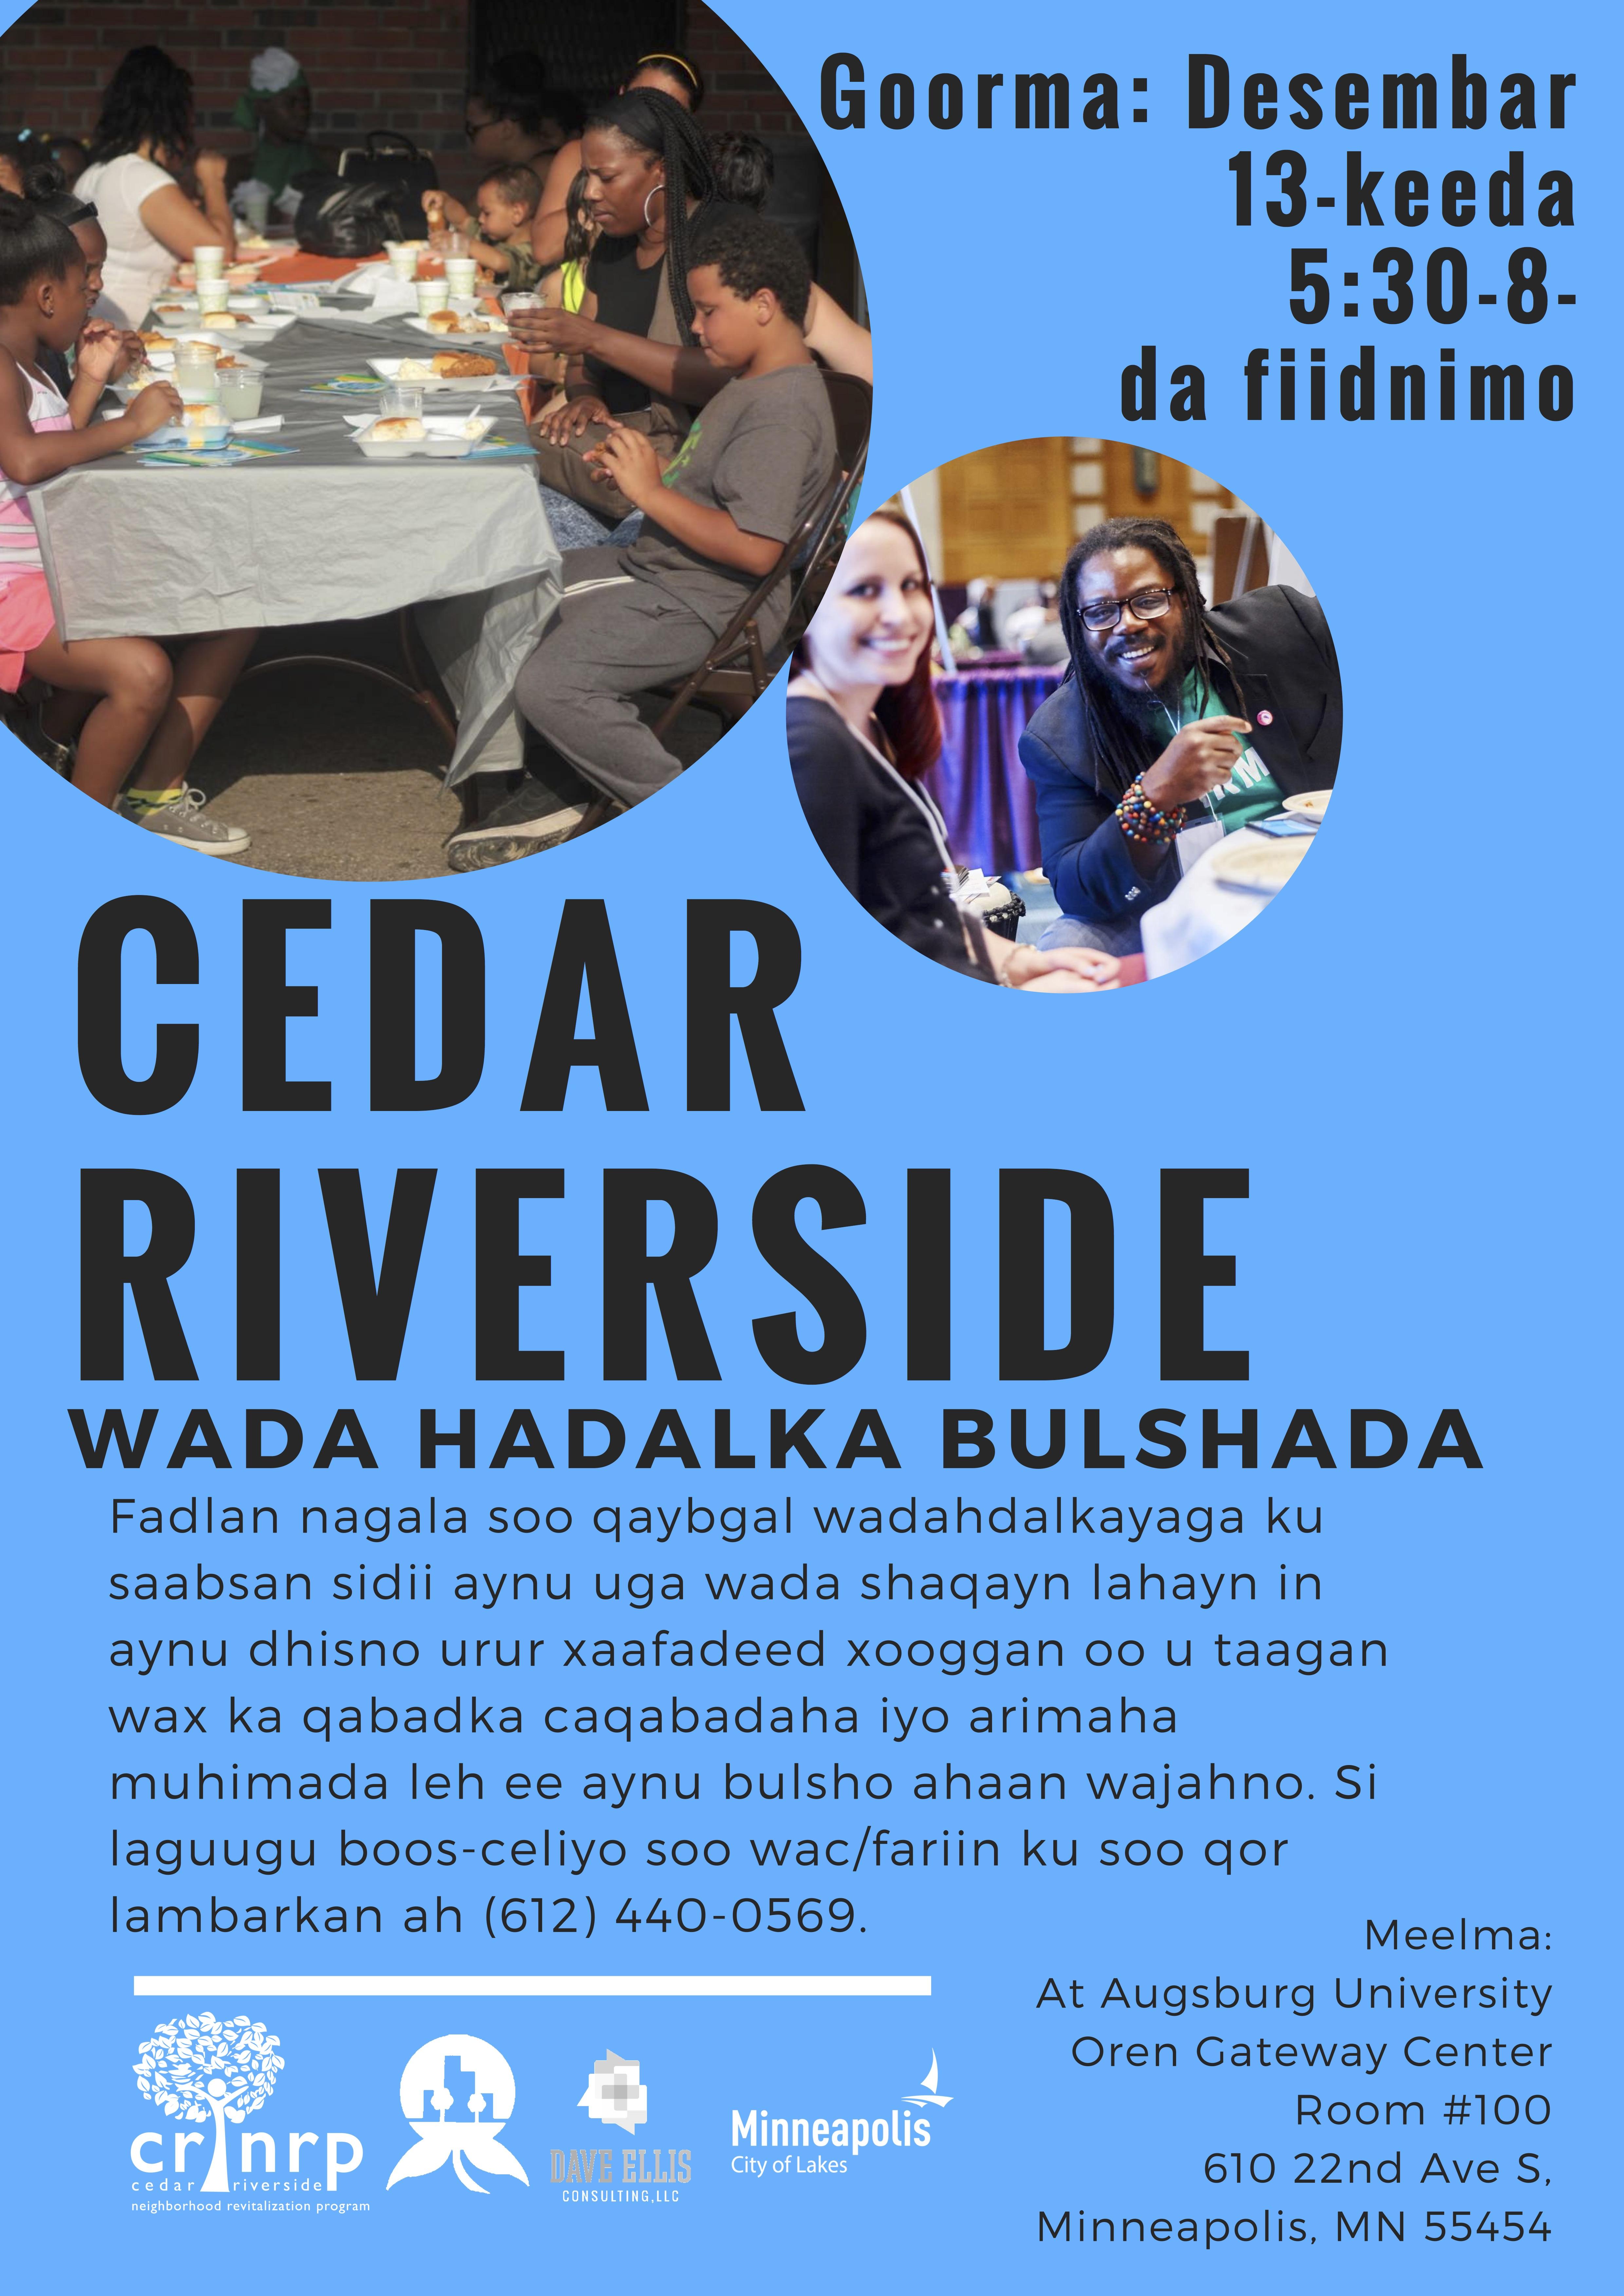 1213_Somali_Cedar_Riverside_Community_Gathering.jpg